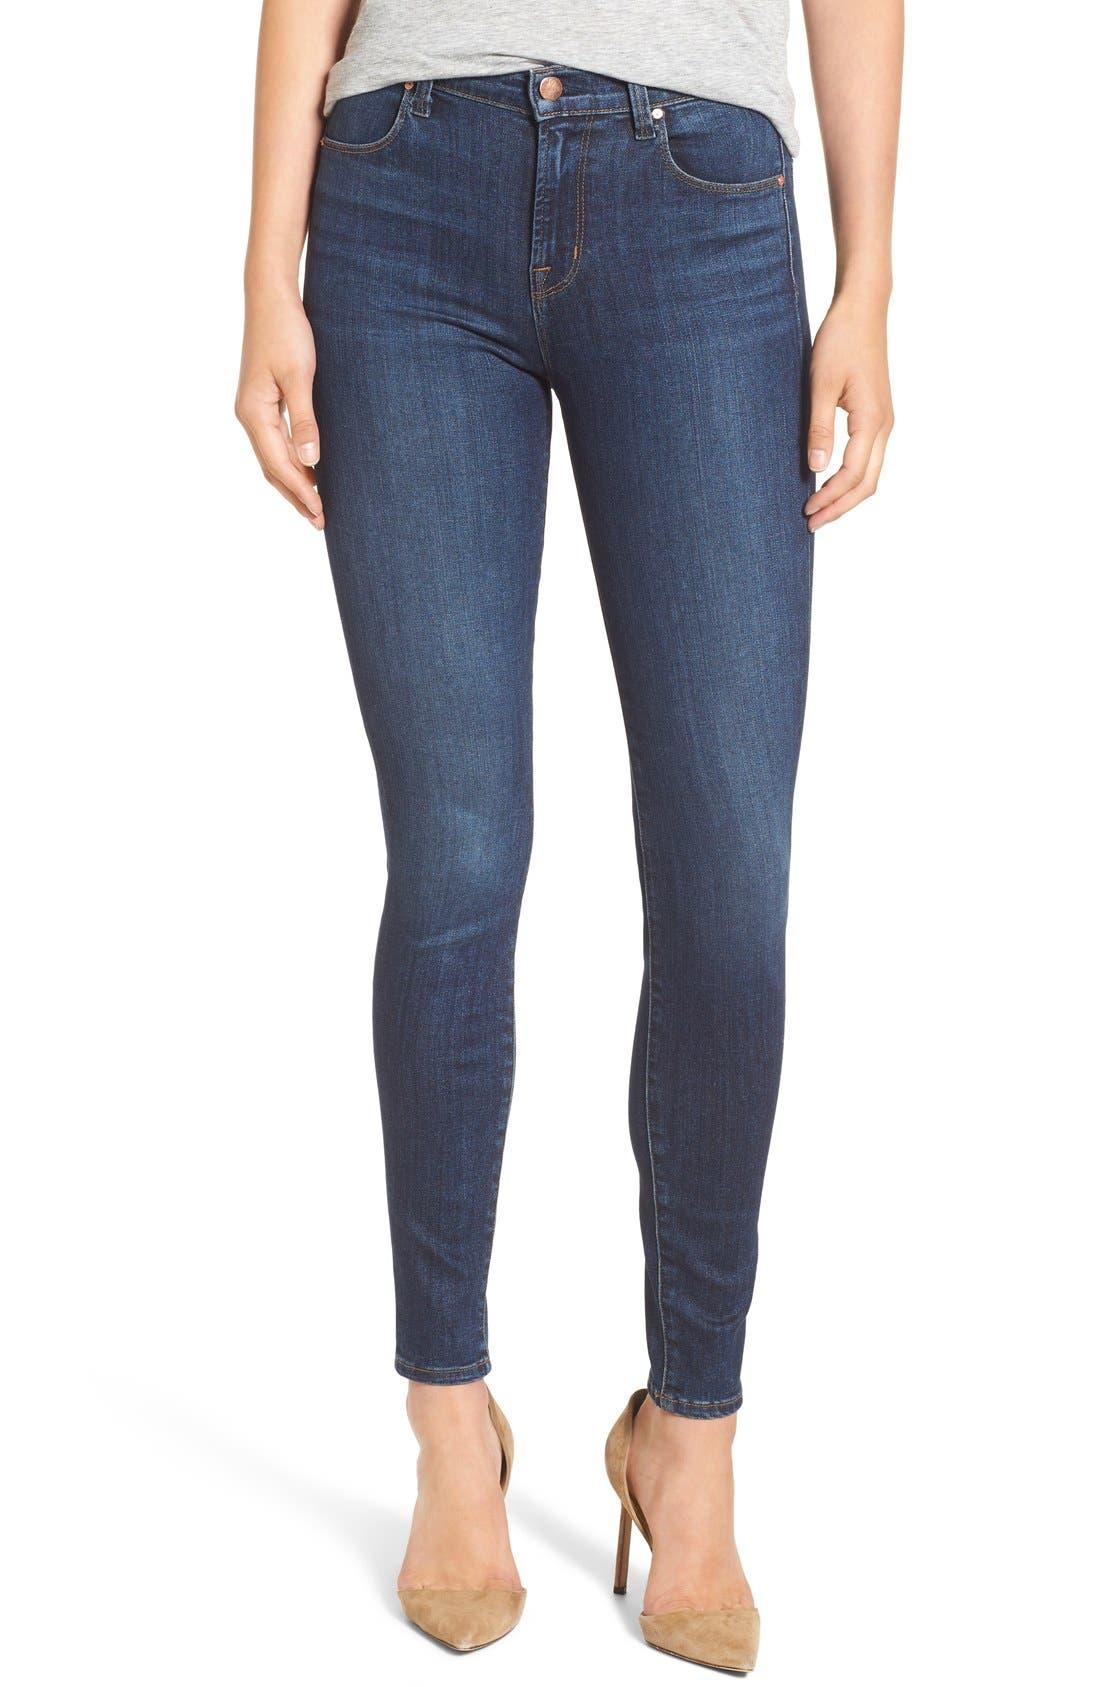 Alternate Image 1 Selected - J Brand Maria High Waist Skinny Jeans (Fleeting)